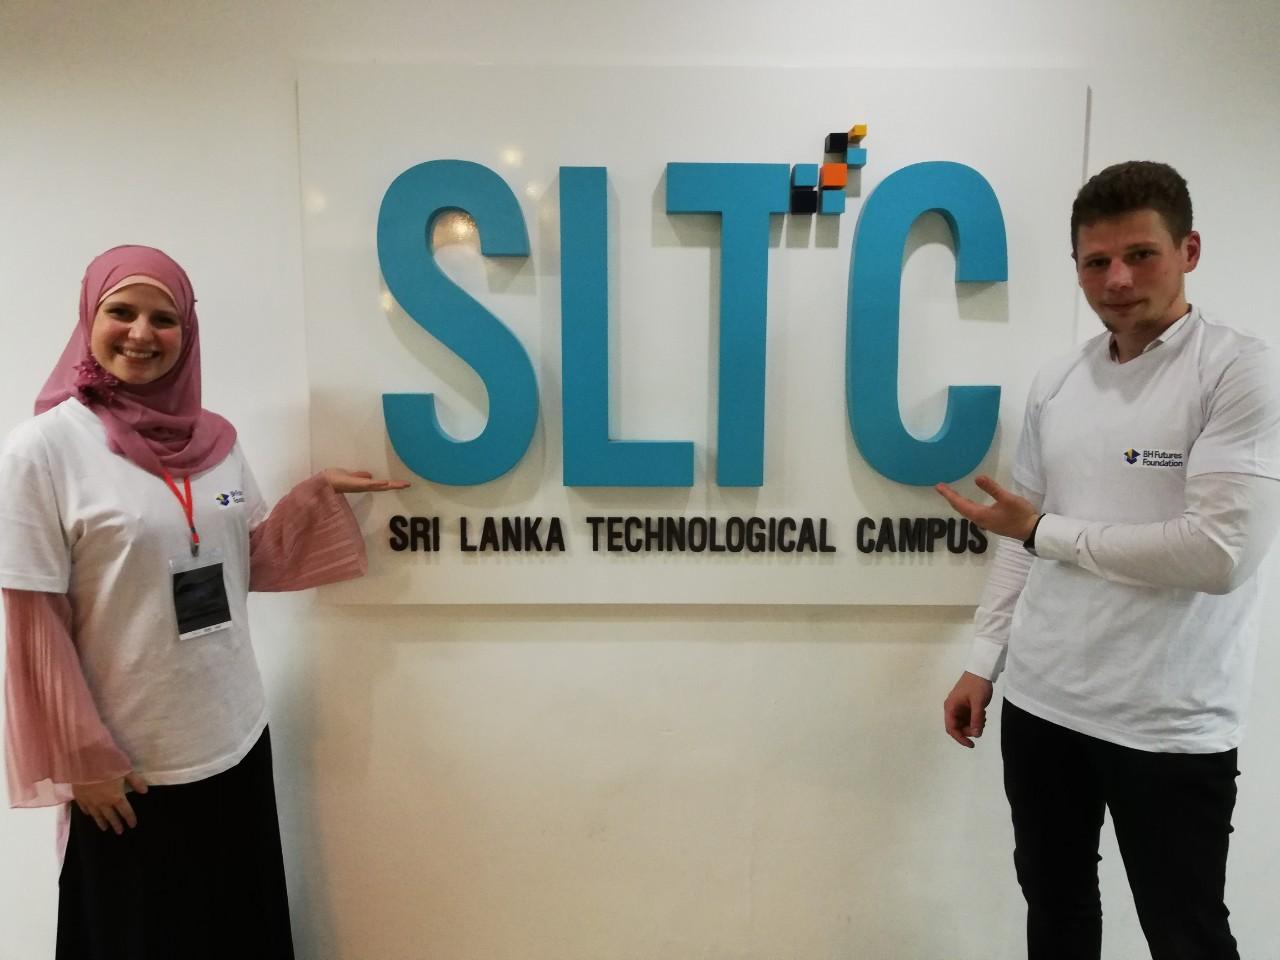 SLTC.jpg